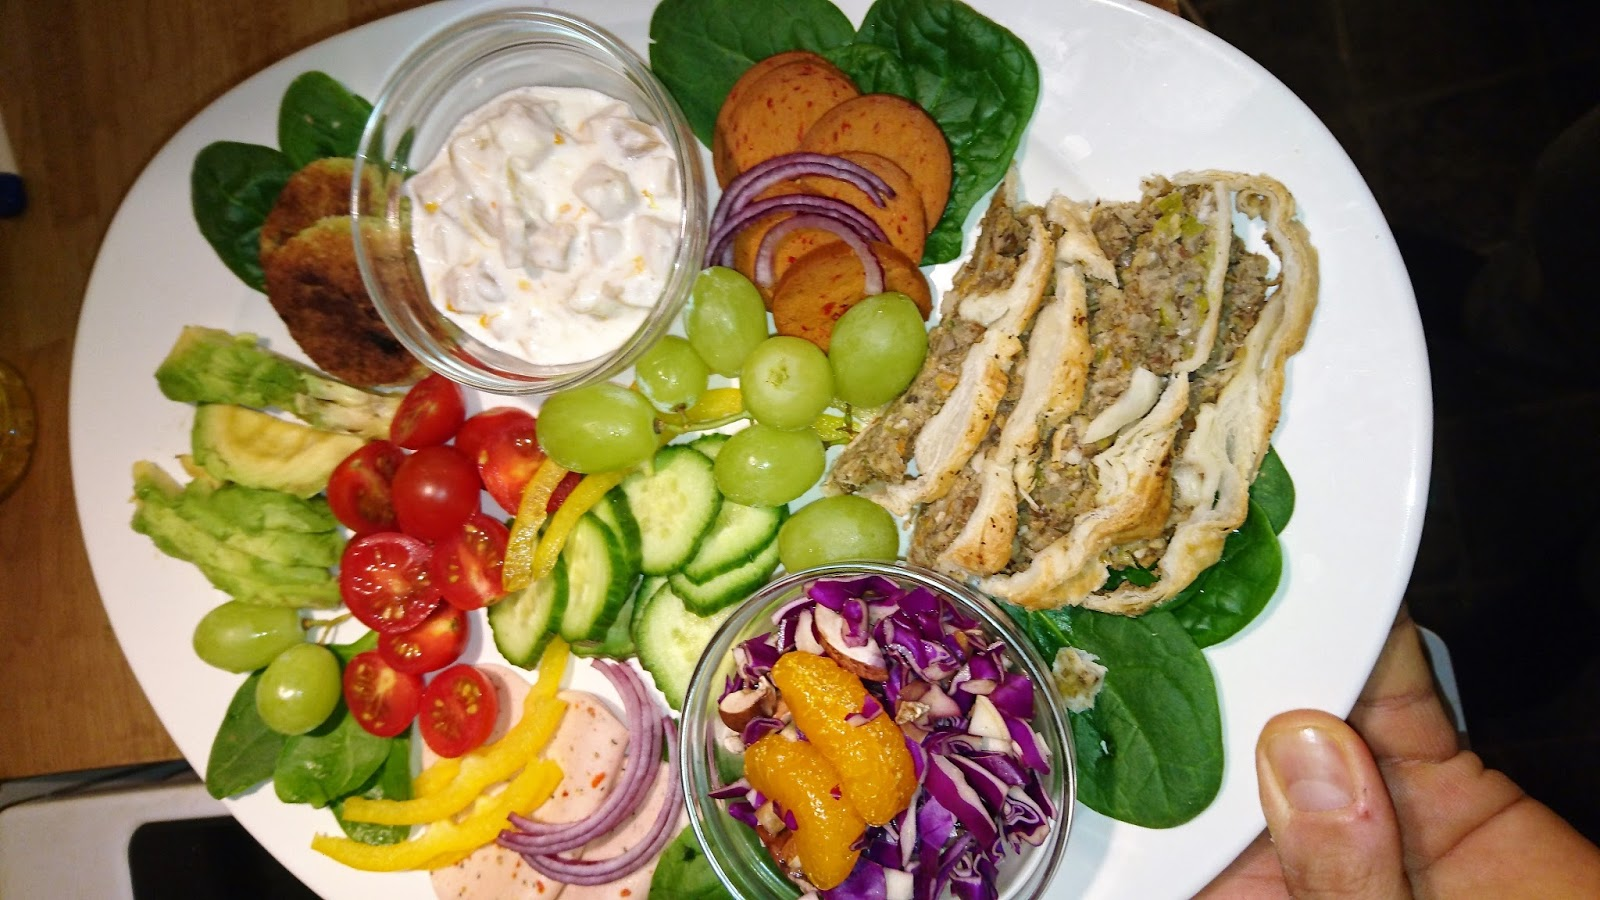 NY VEGETAR: Vegetarisk julefrokost - Vegansk julefrokost